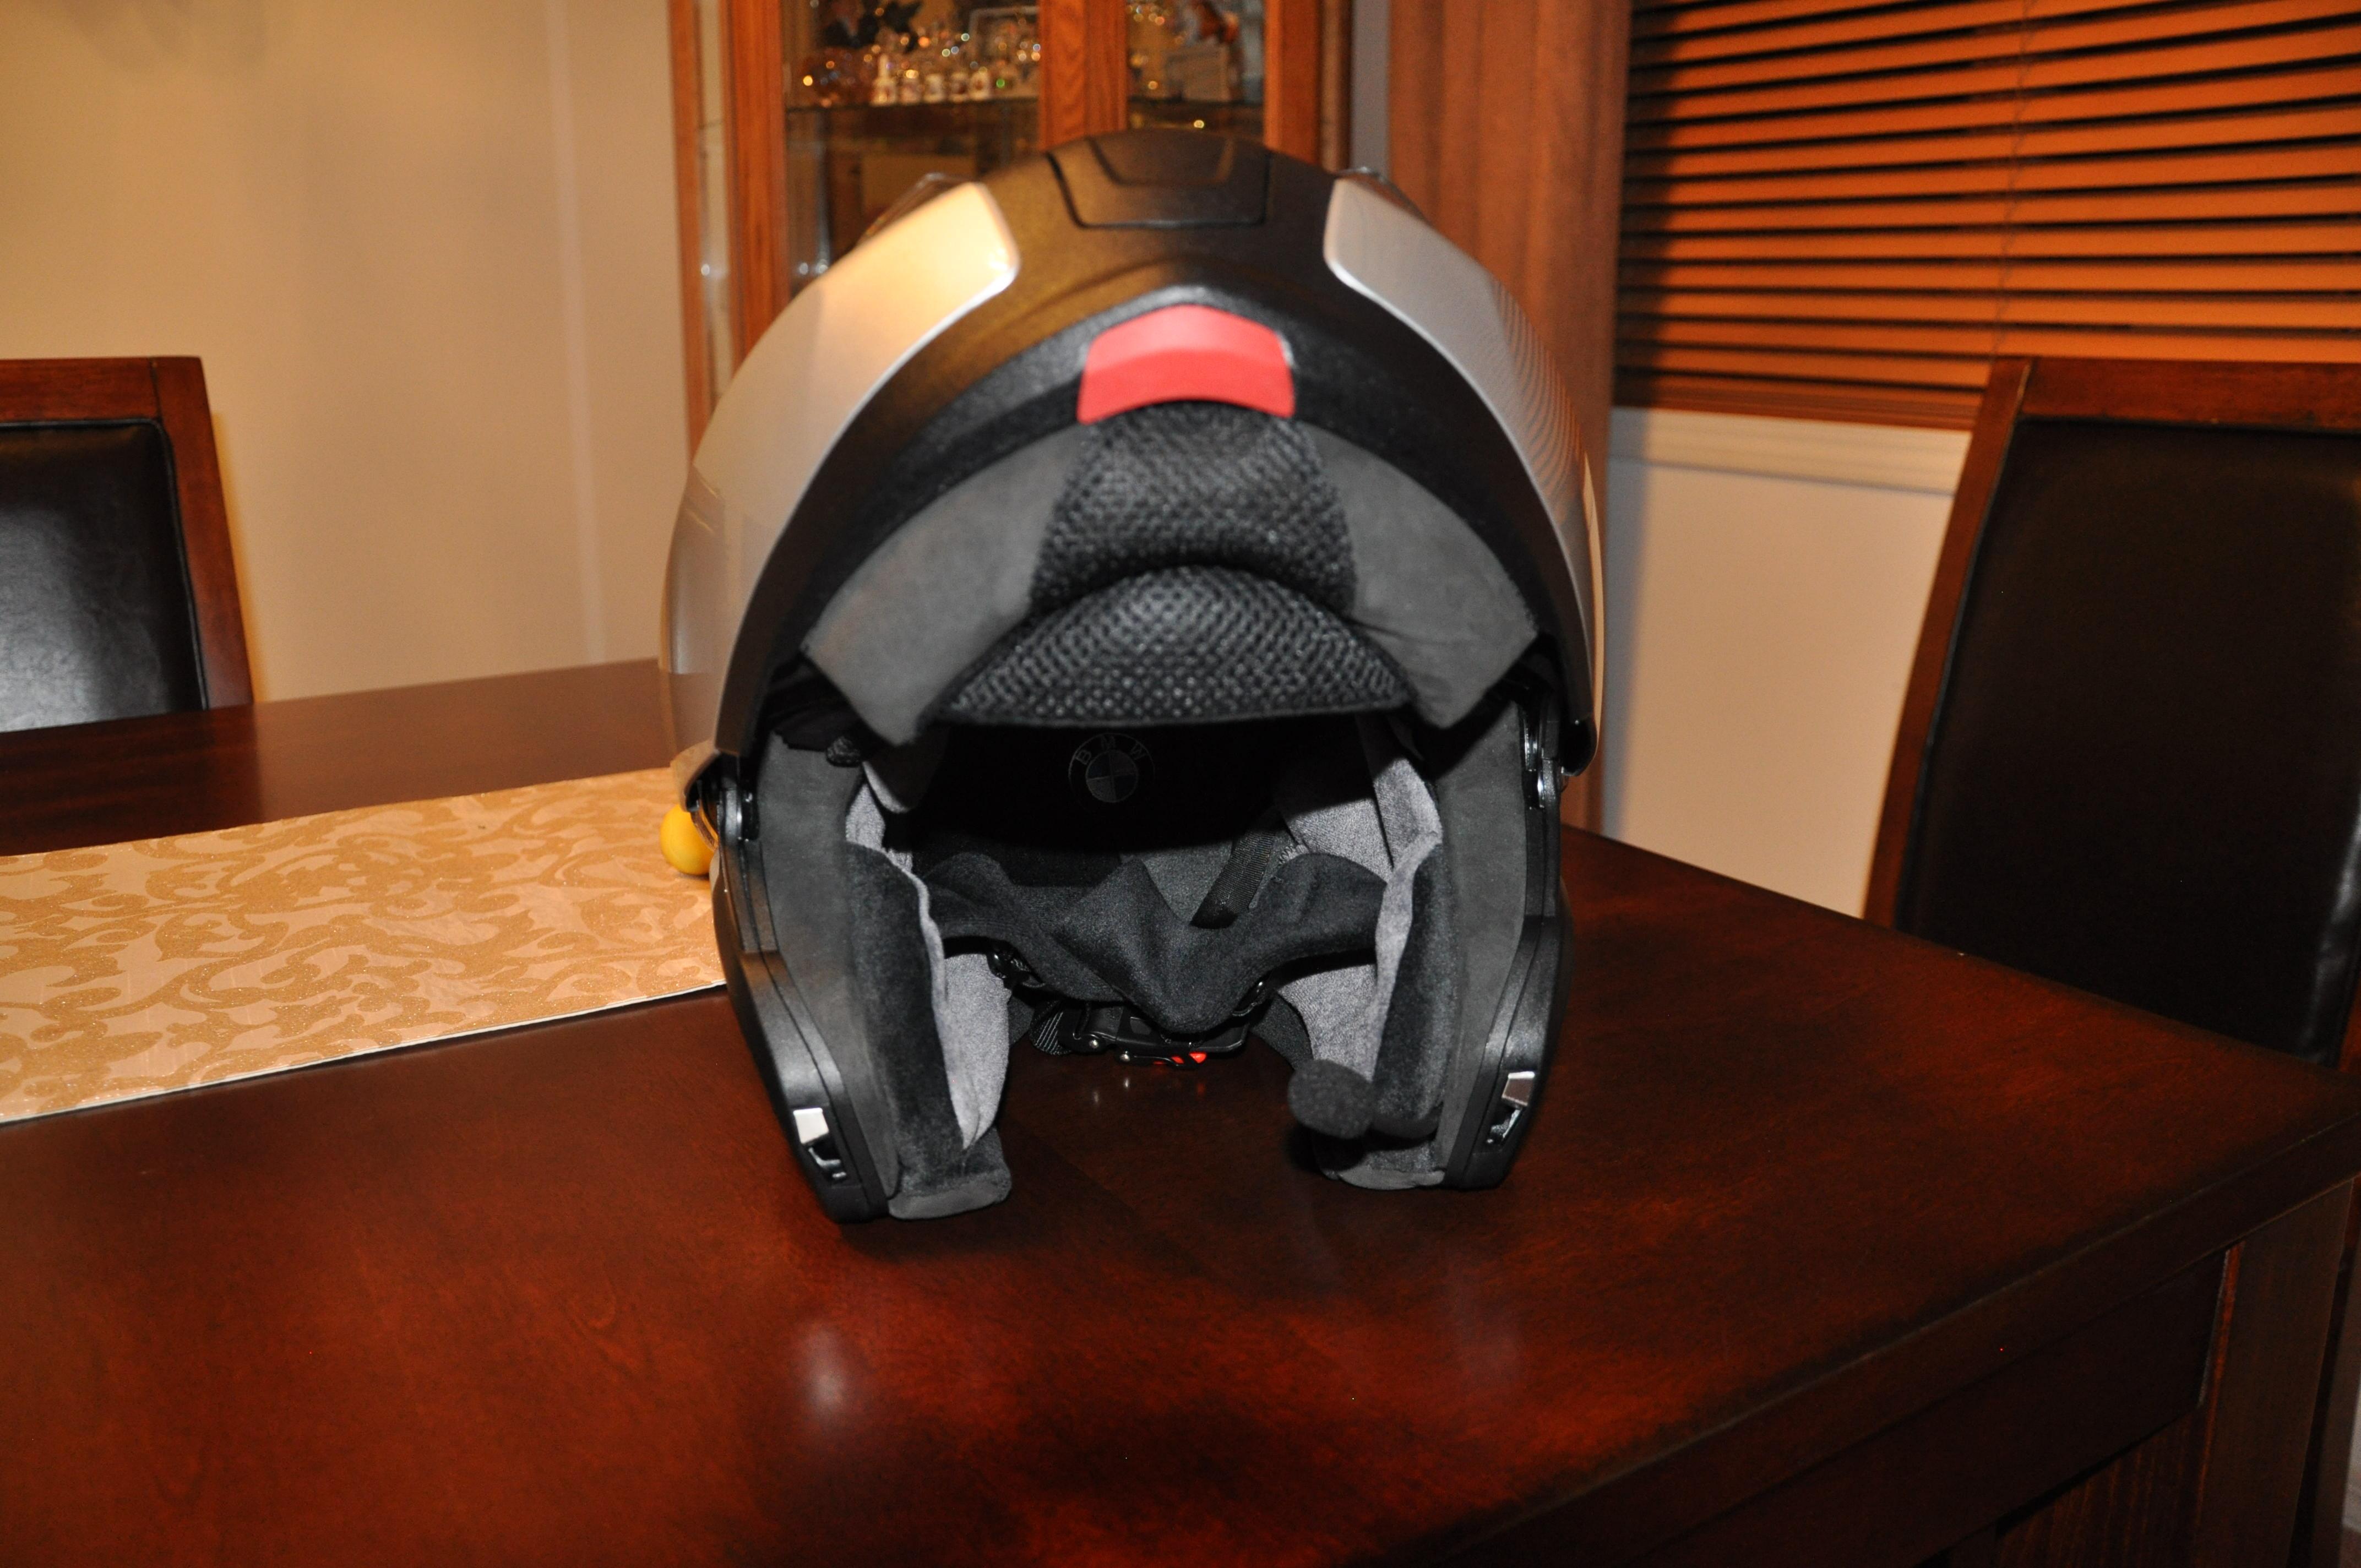 BMW System 6 EVO Helmet-dsc_1531.jpg